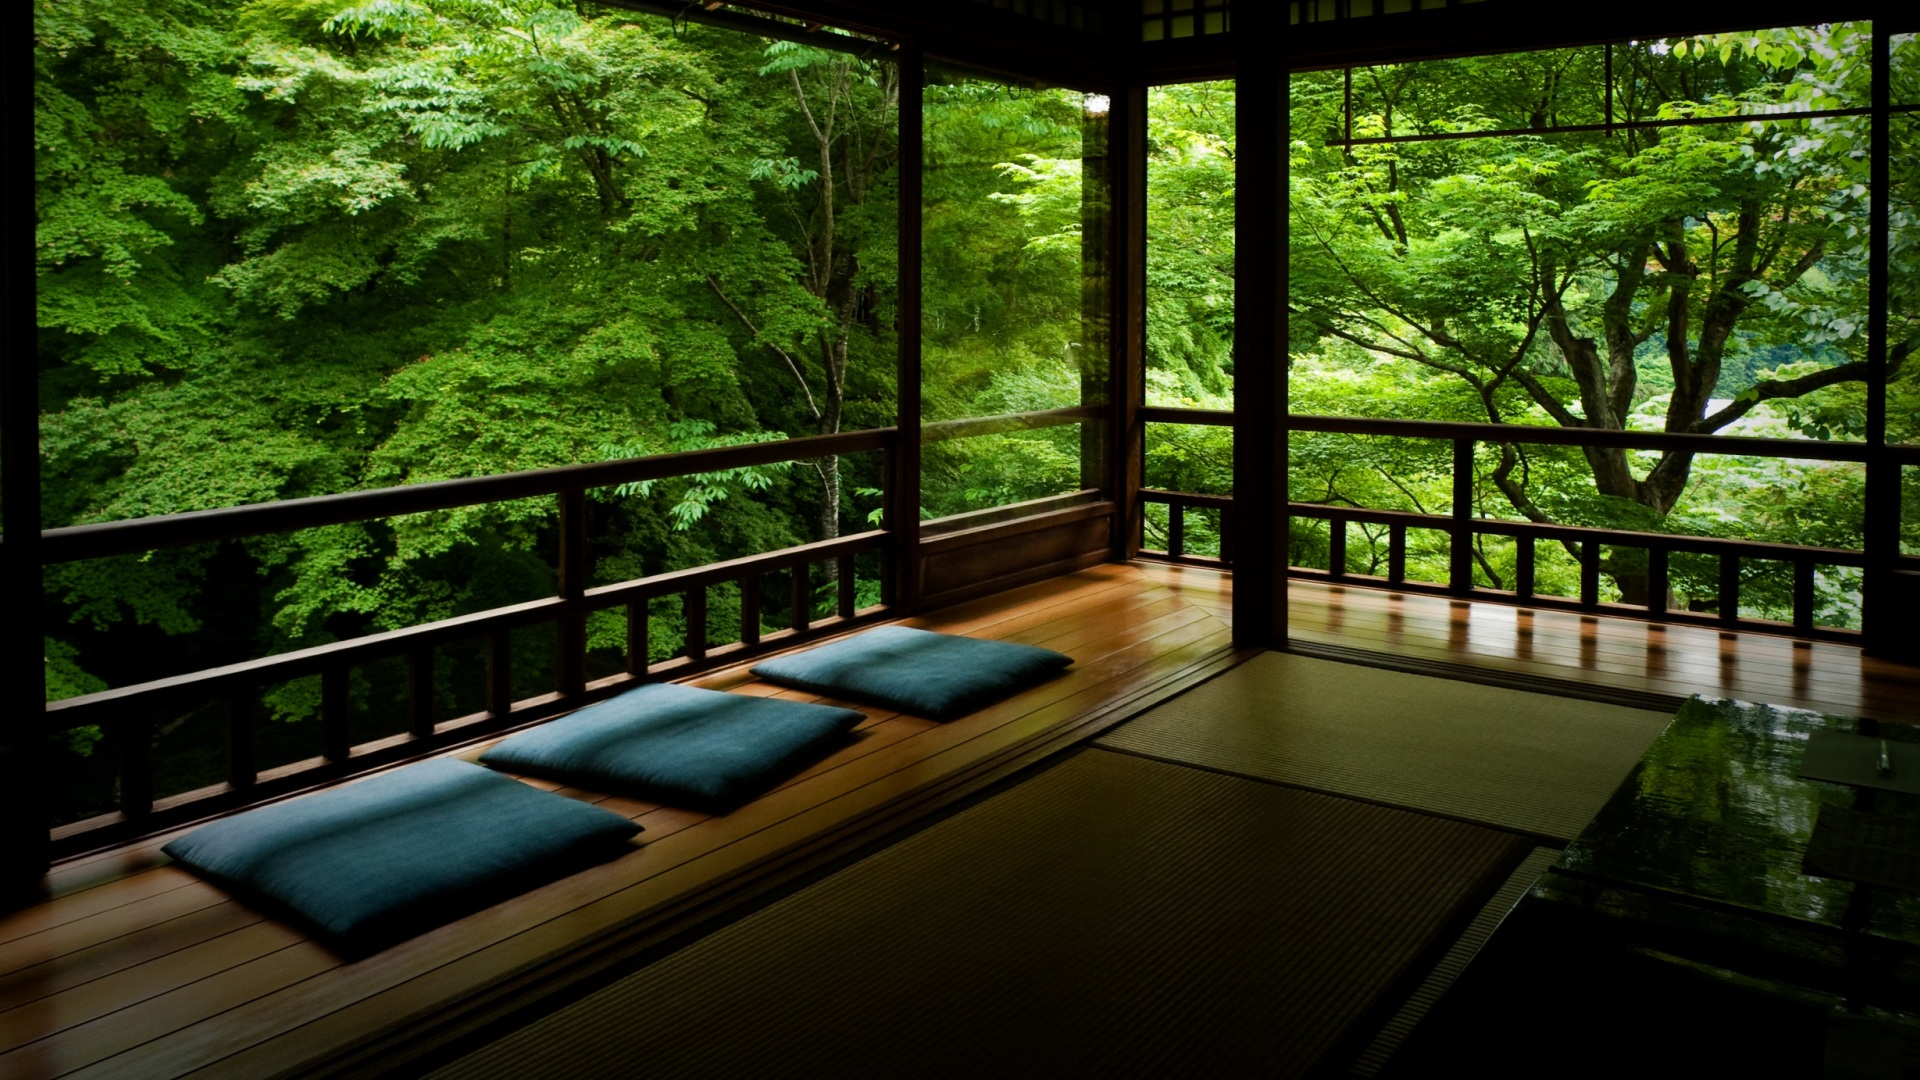 Japan House Indoor HD Wallpaper 1920x1080 ID26749 1920x1080